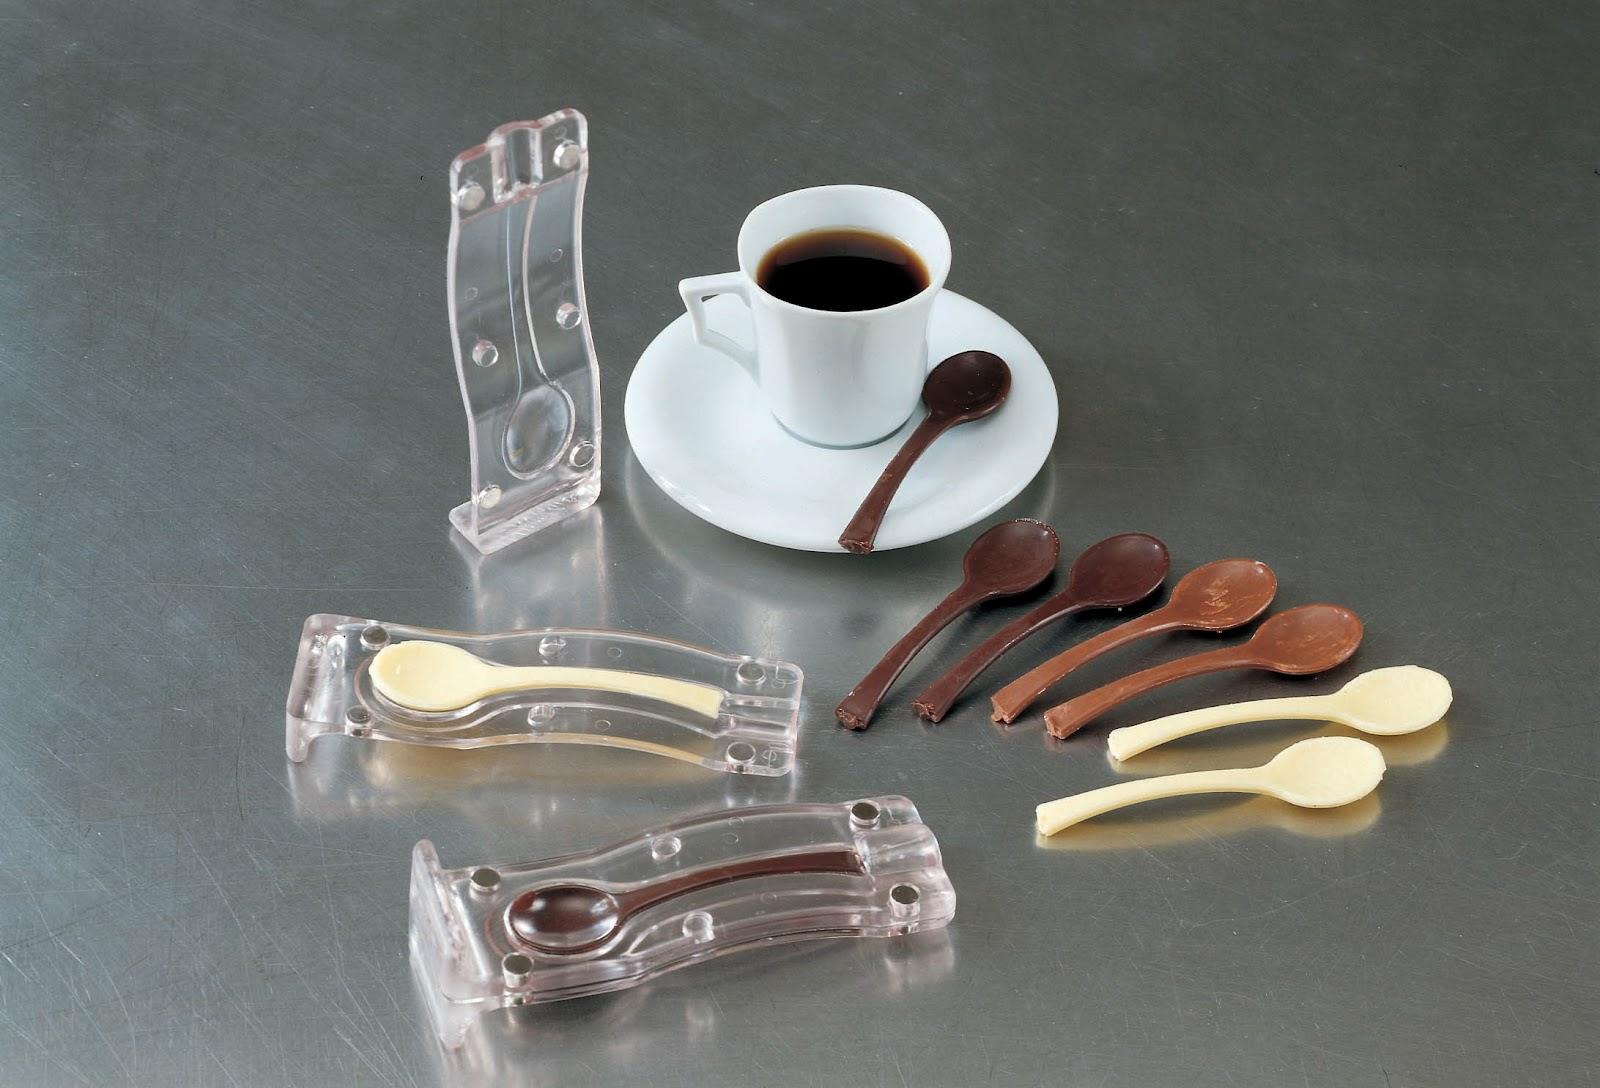 Формочки из шоколада своими руками фото 401